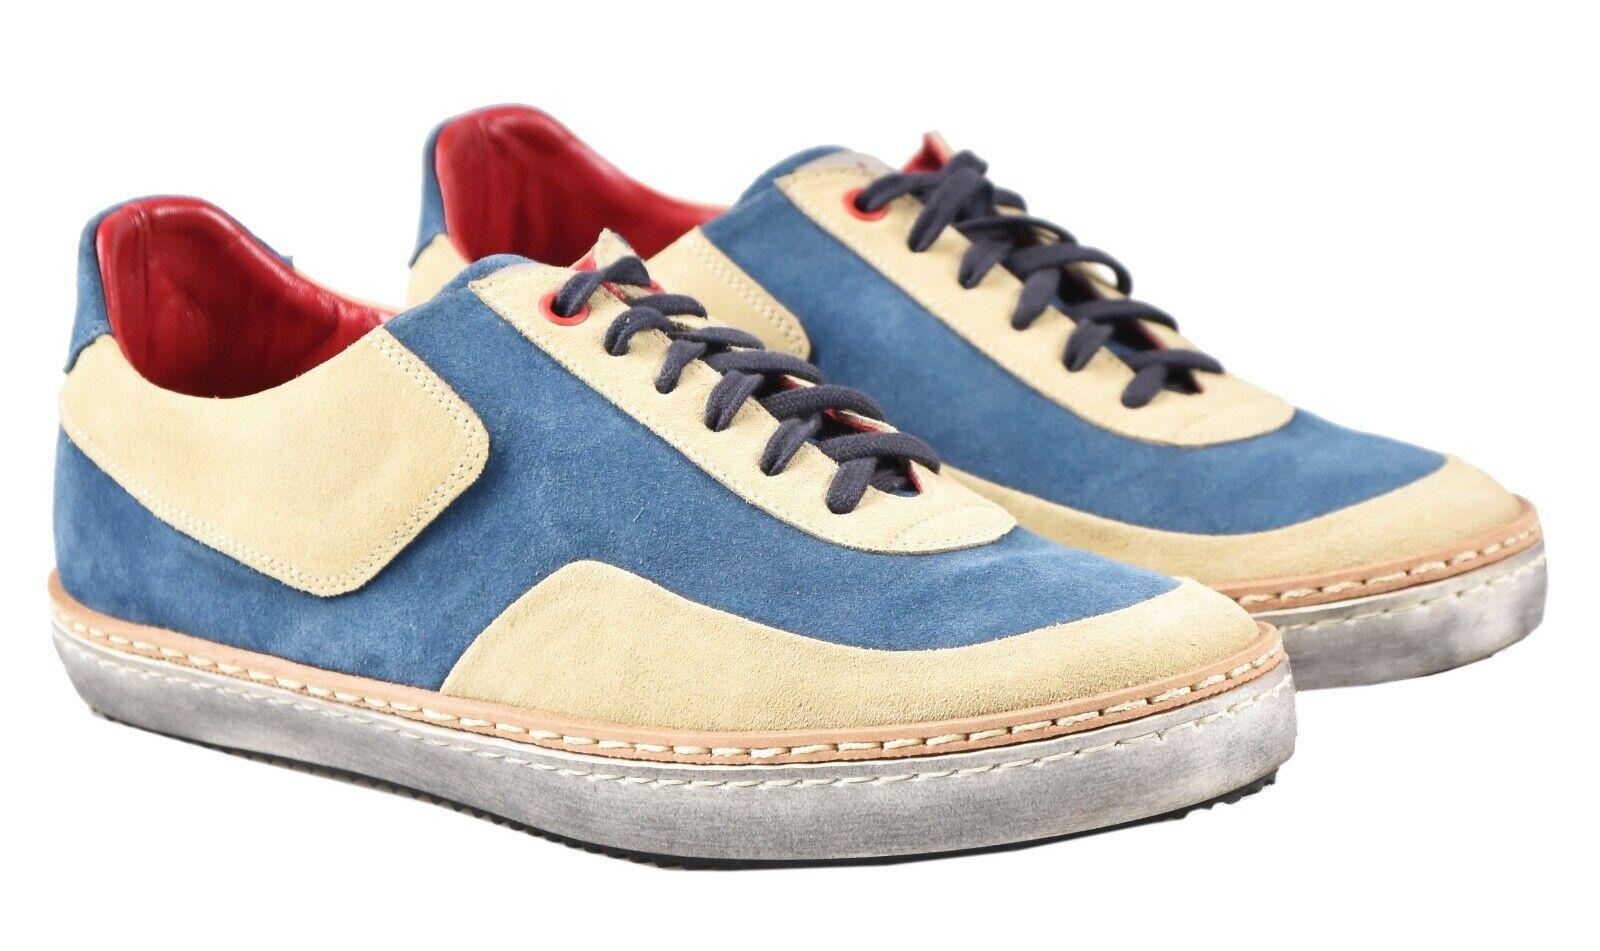 NEW KITON scarpe scarpe da ginnastica 100% LEATHER SZ 7 US 40 EU 19O78